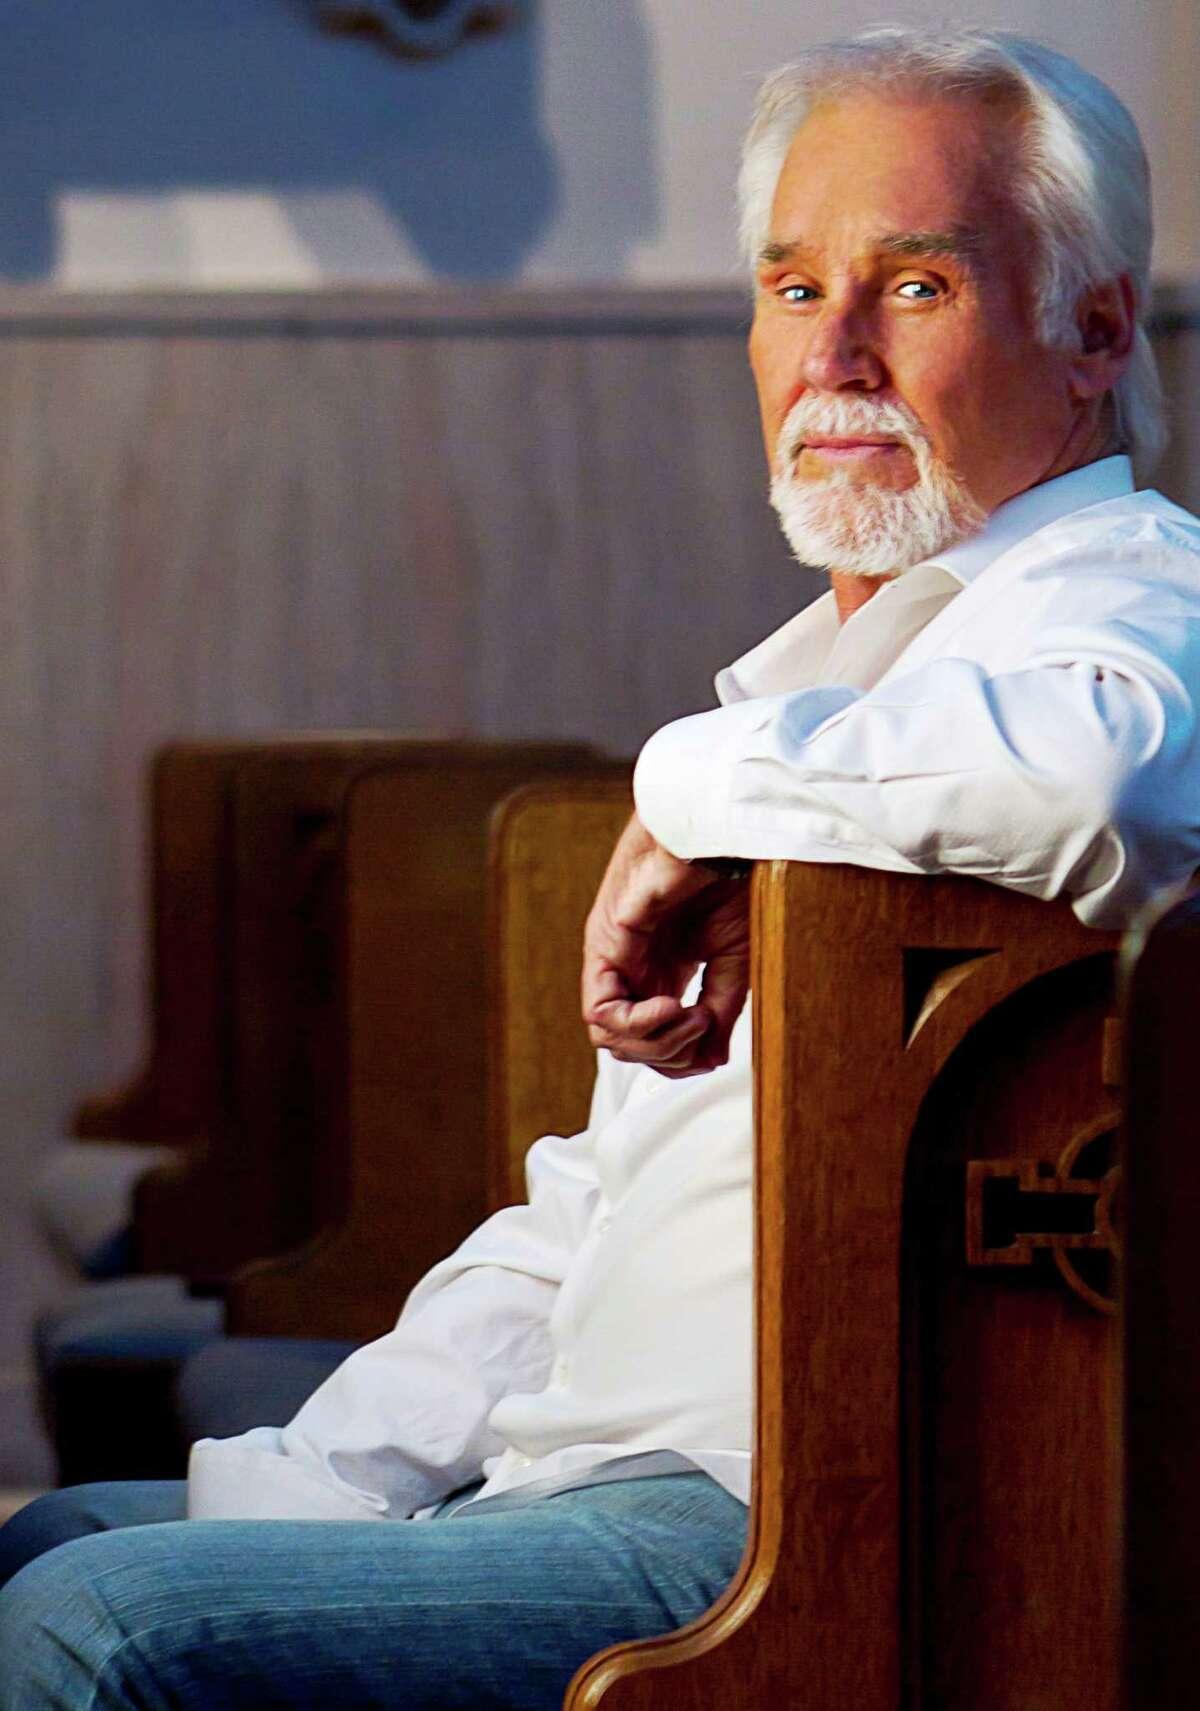 Kenny Rogers is coming to San Antonio's Majestic Theatre, Dec. 10, 2012.